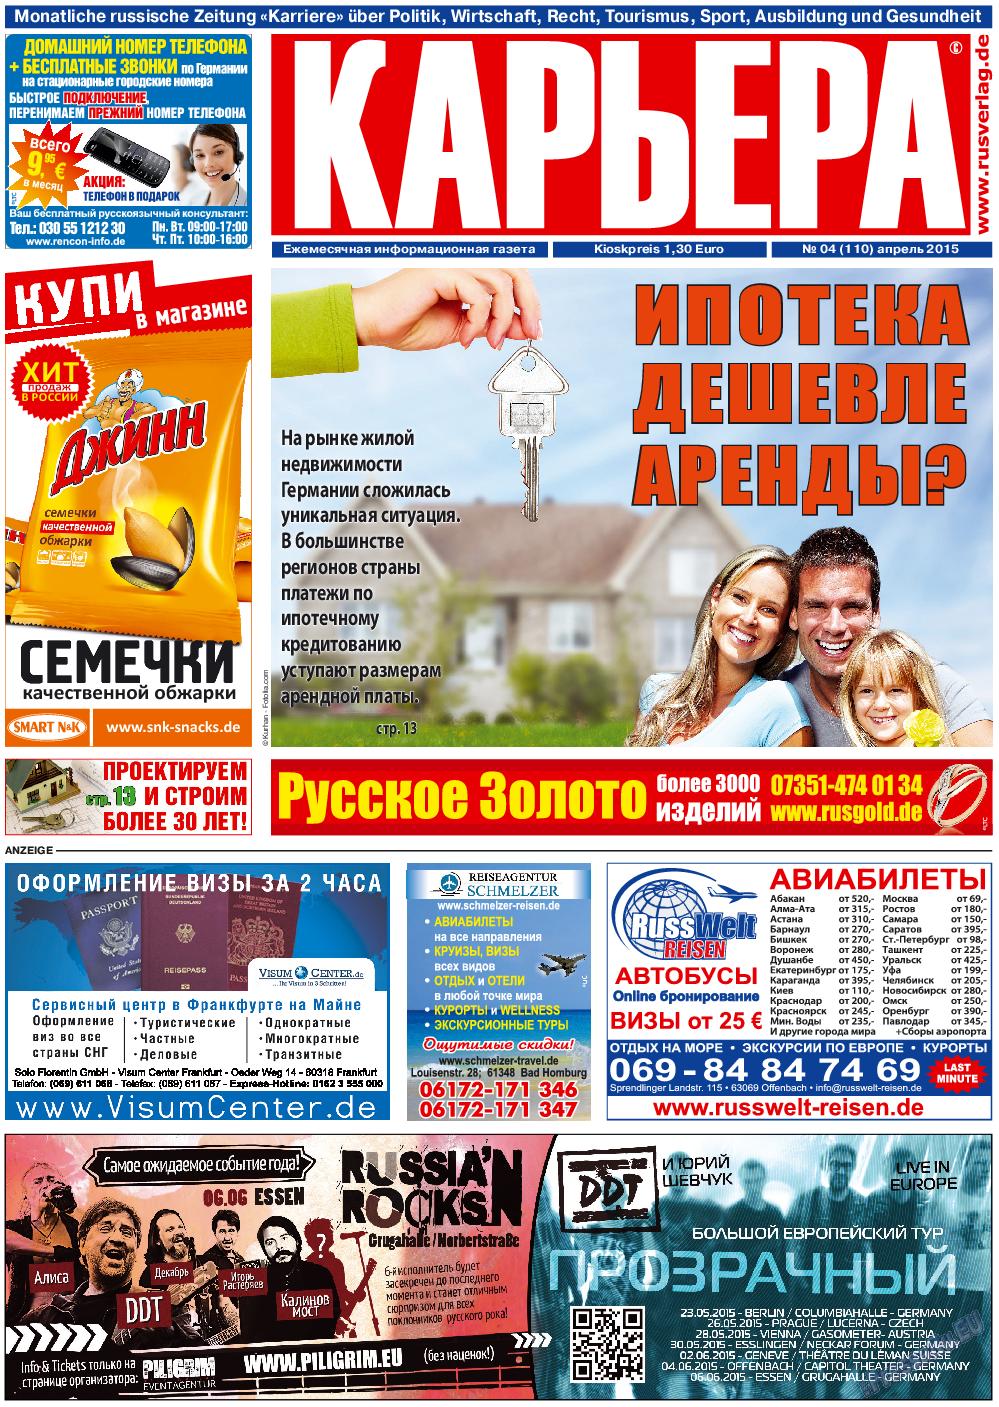 Карьера (газета). 2015 год, номер 4, стр. 1